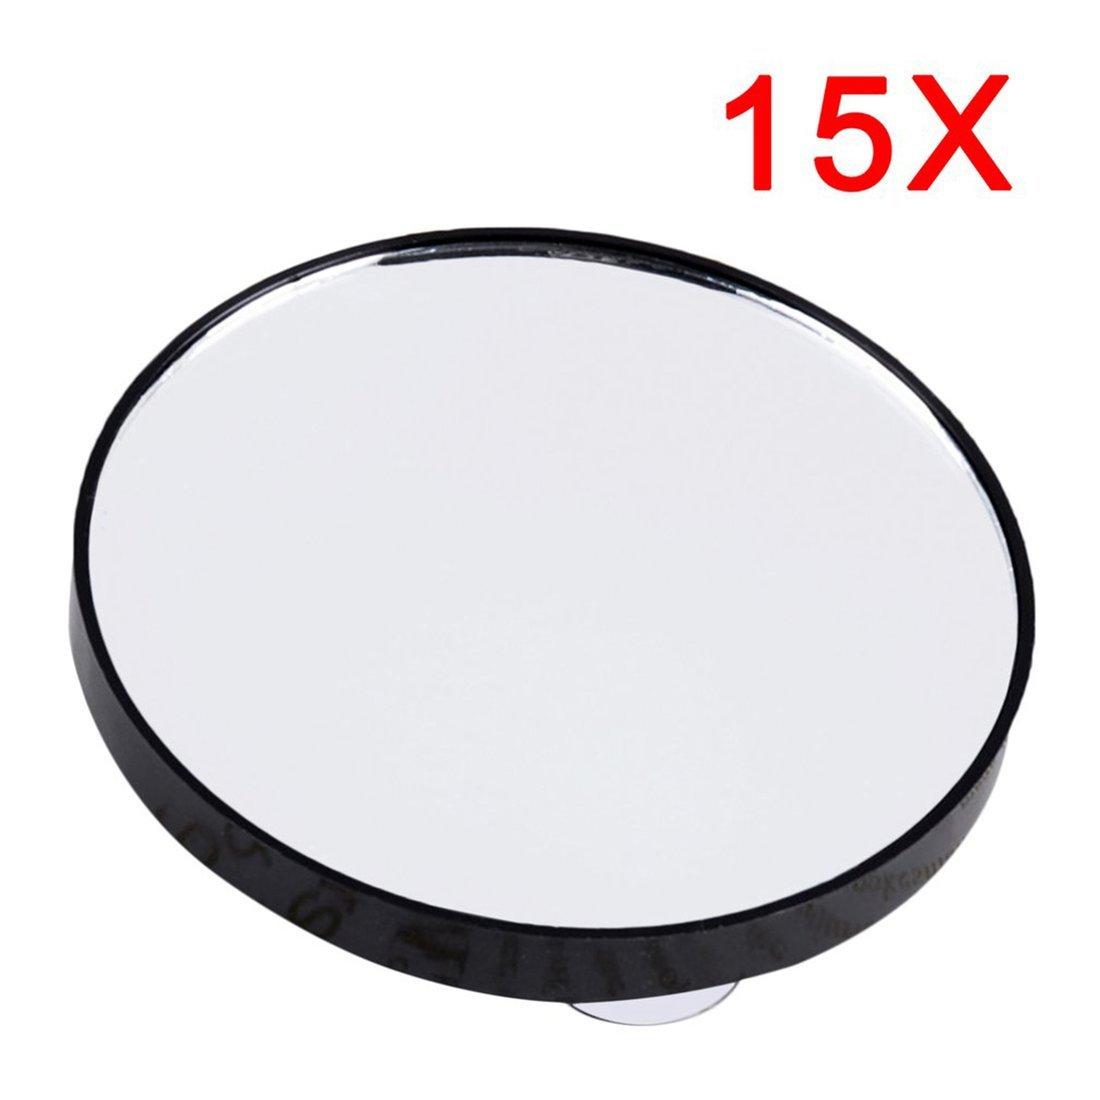 Vanity Makeup Mirror 5X 10X 15X Espejo de aumento con dos ventosas Cosmetics Tools Mini Espejo de bañ o redondo Espejo Formulaone